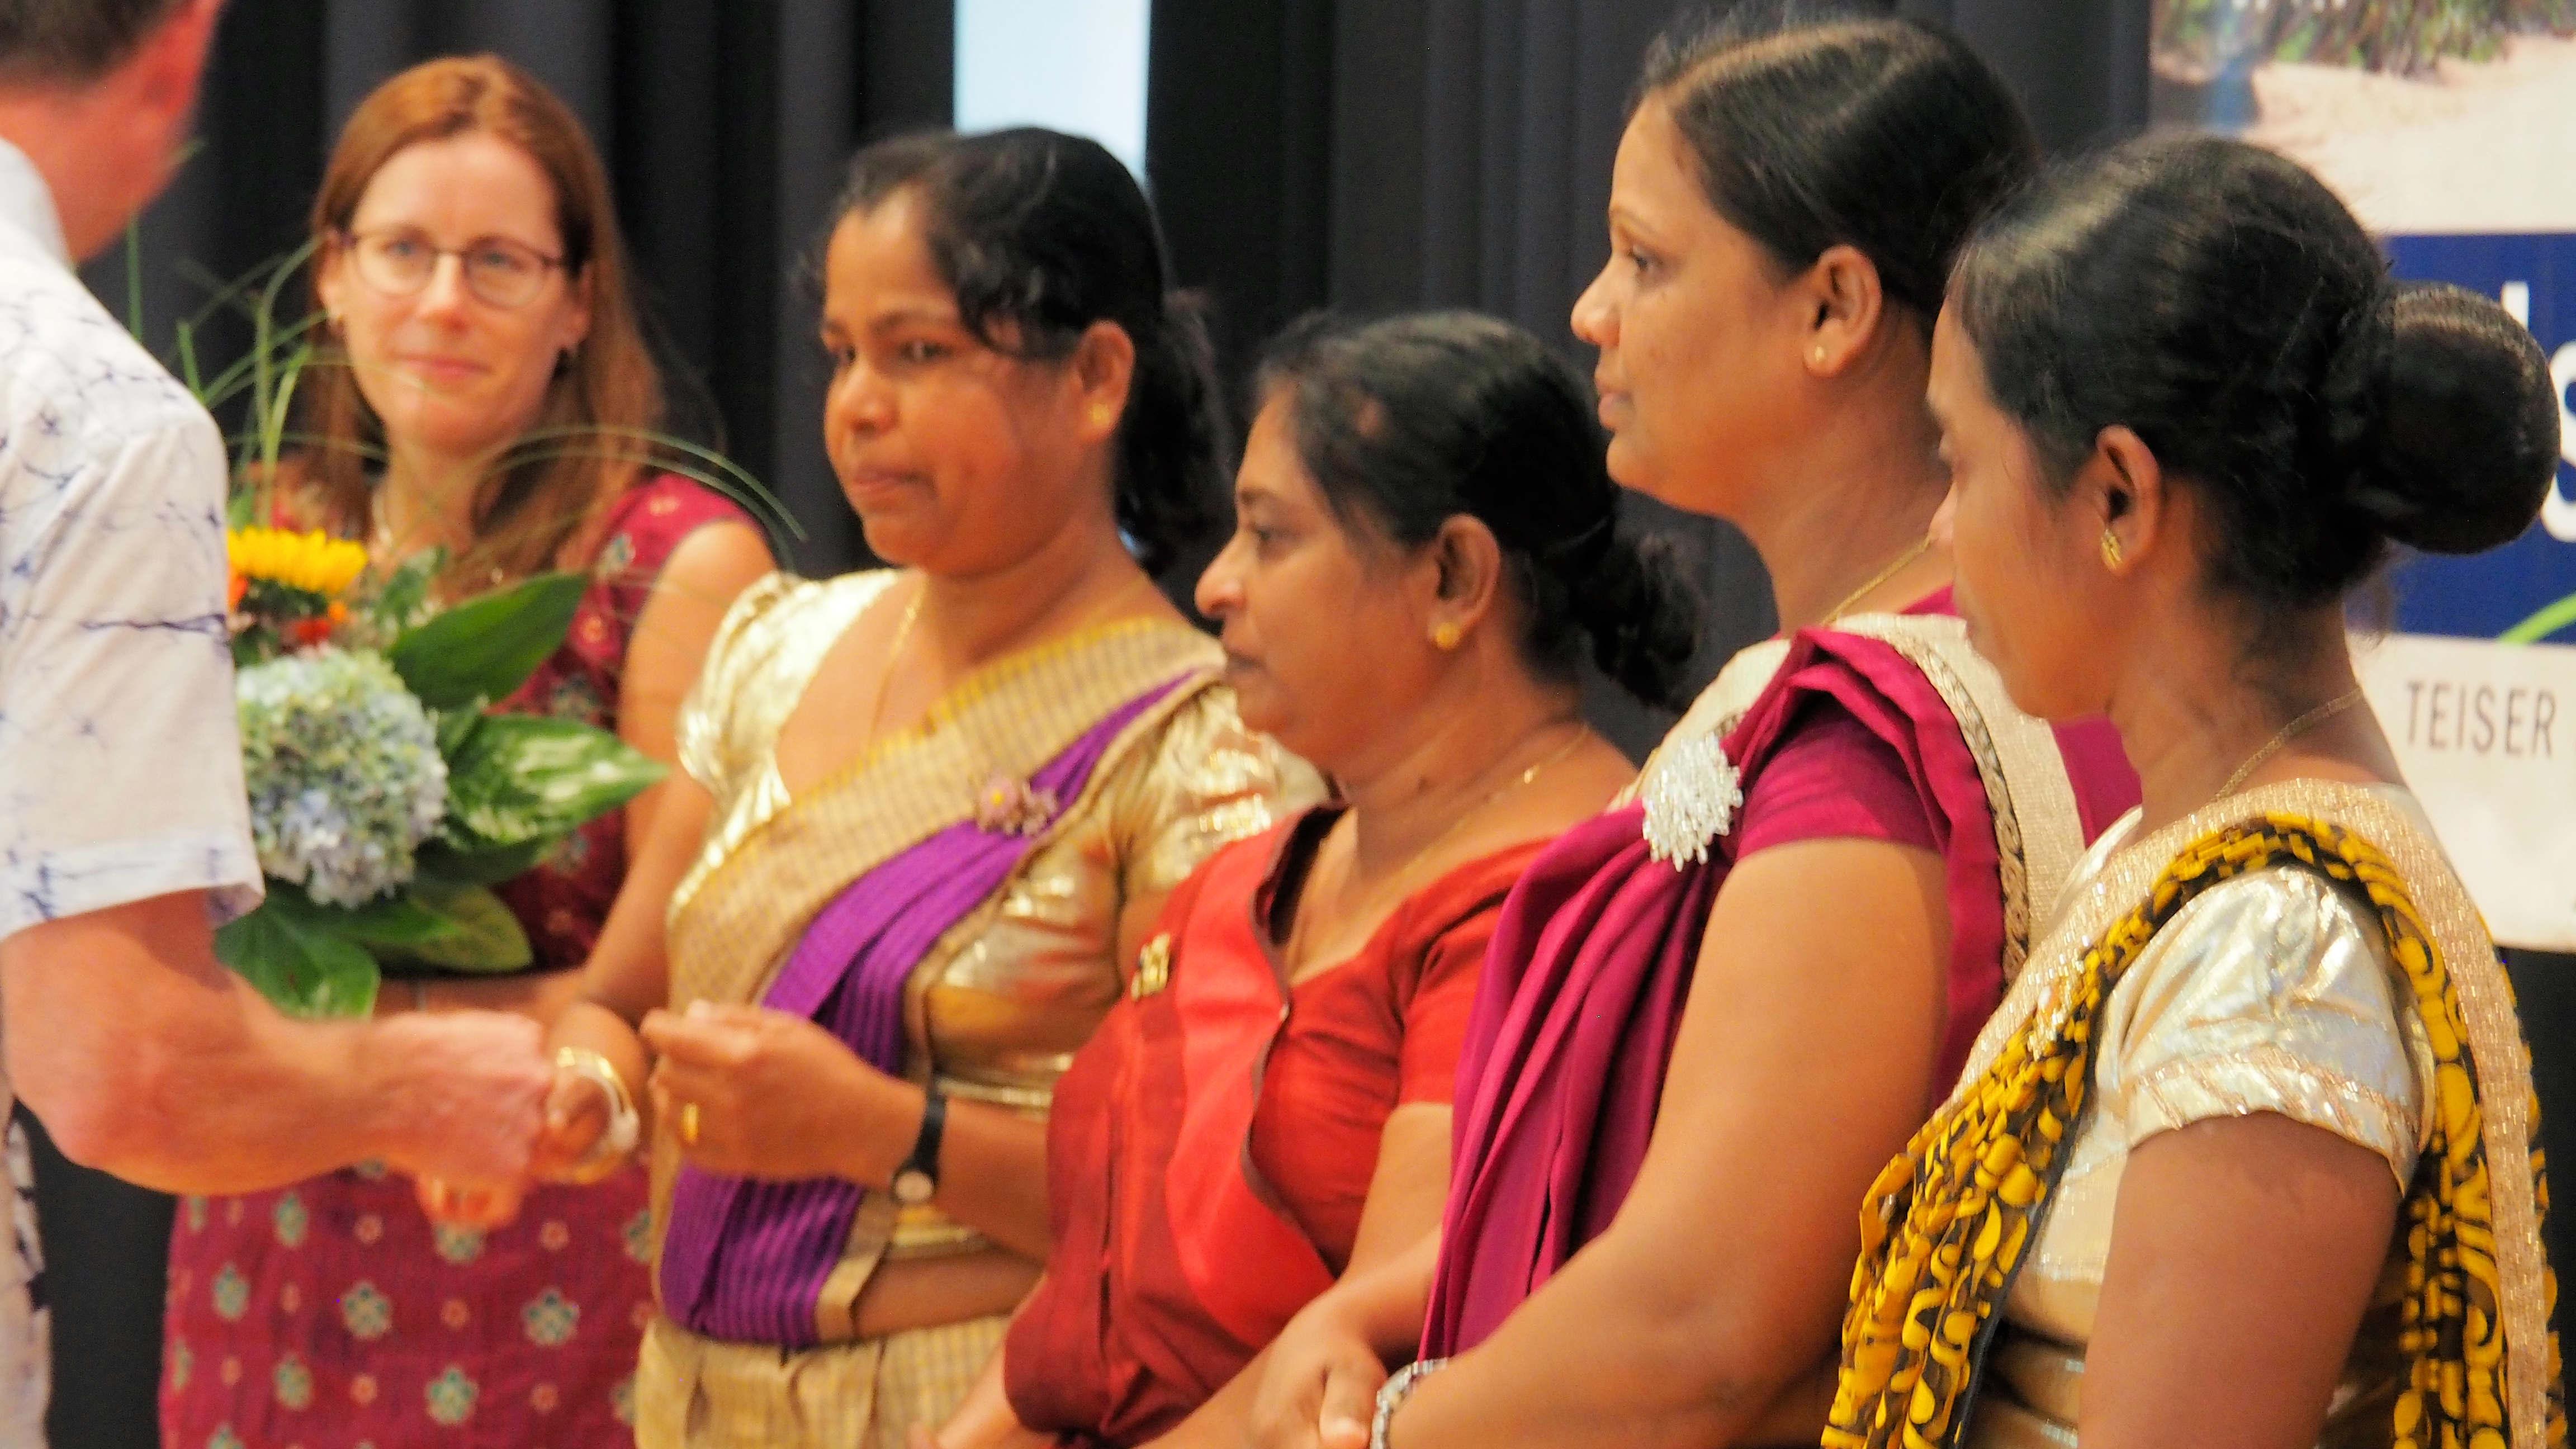 Zur Jubiläumsfeier waren vier Kindergärtnerinnen aus Sri Lanka angereist